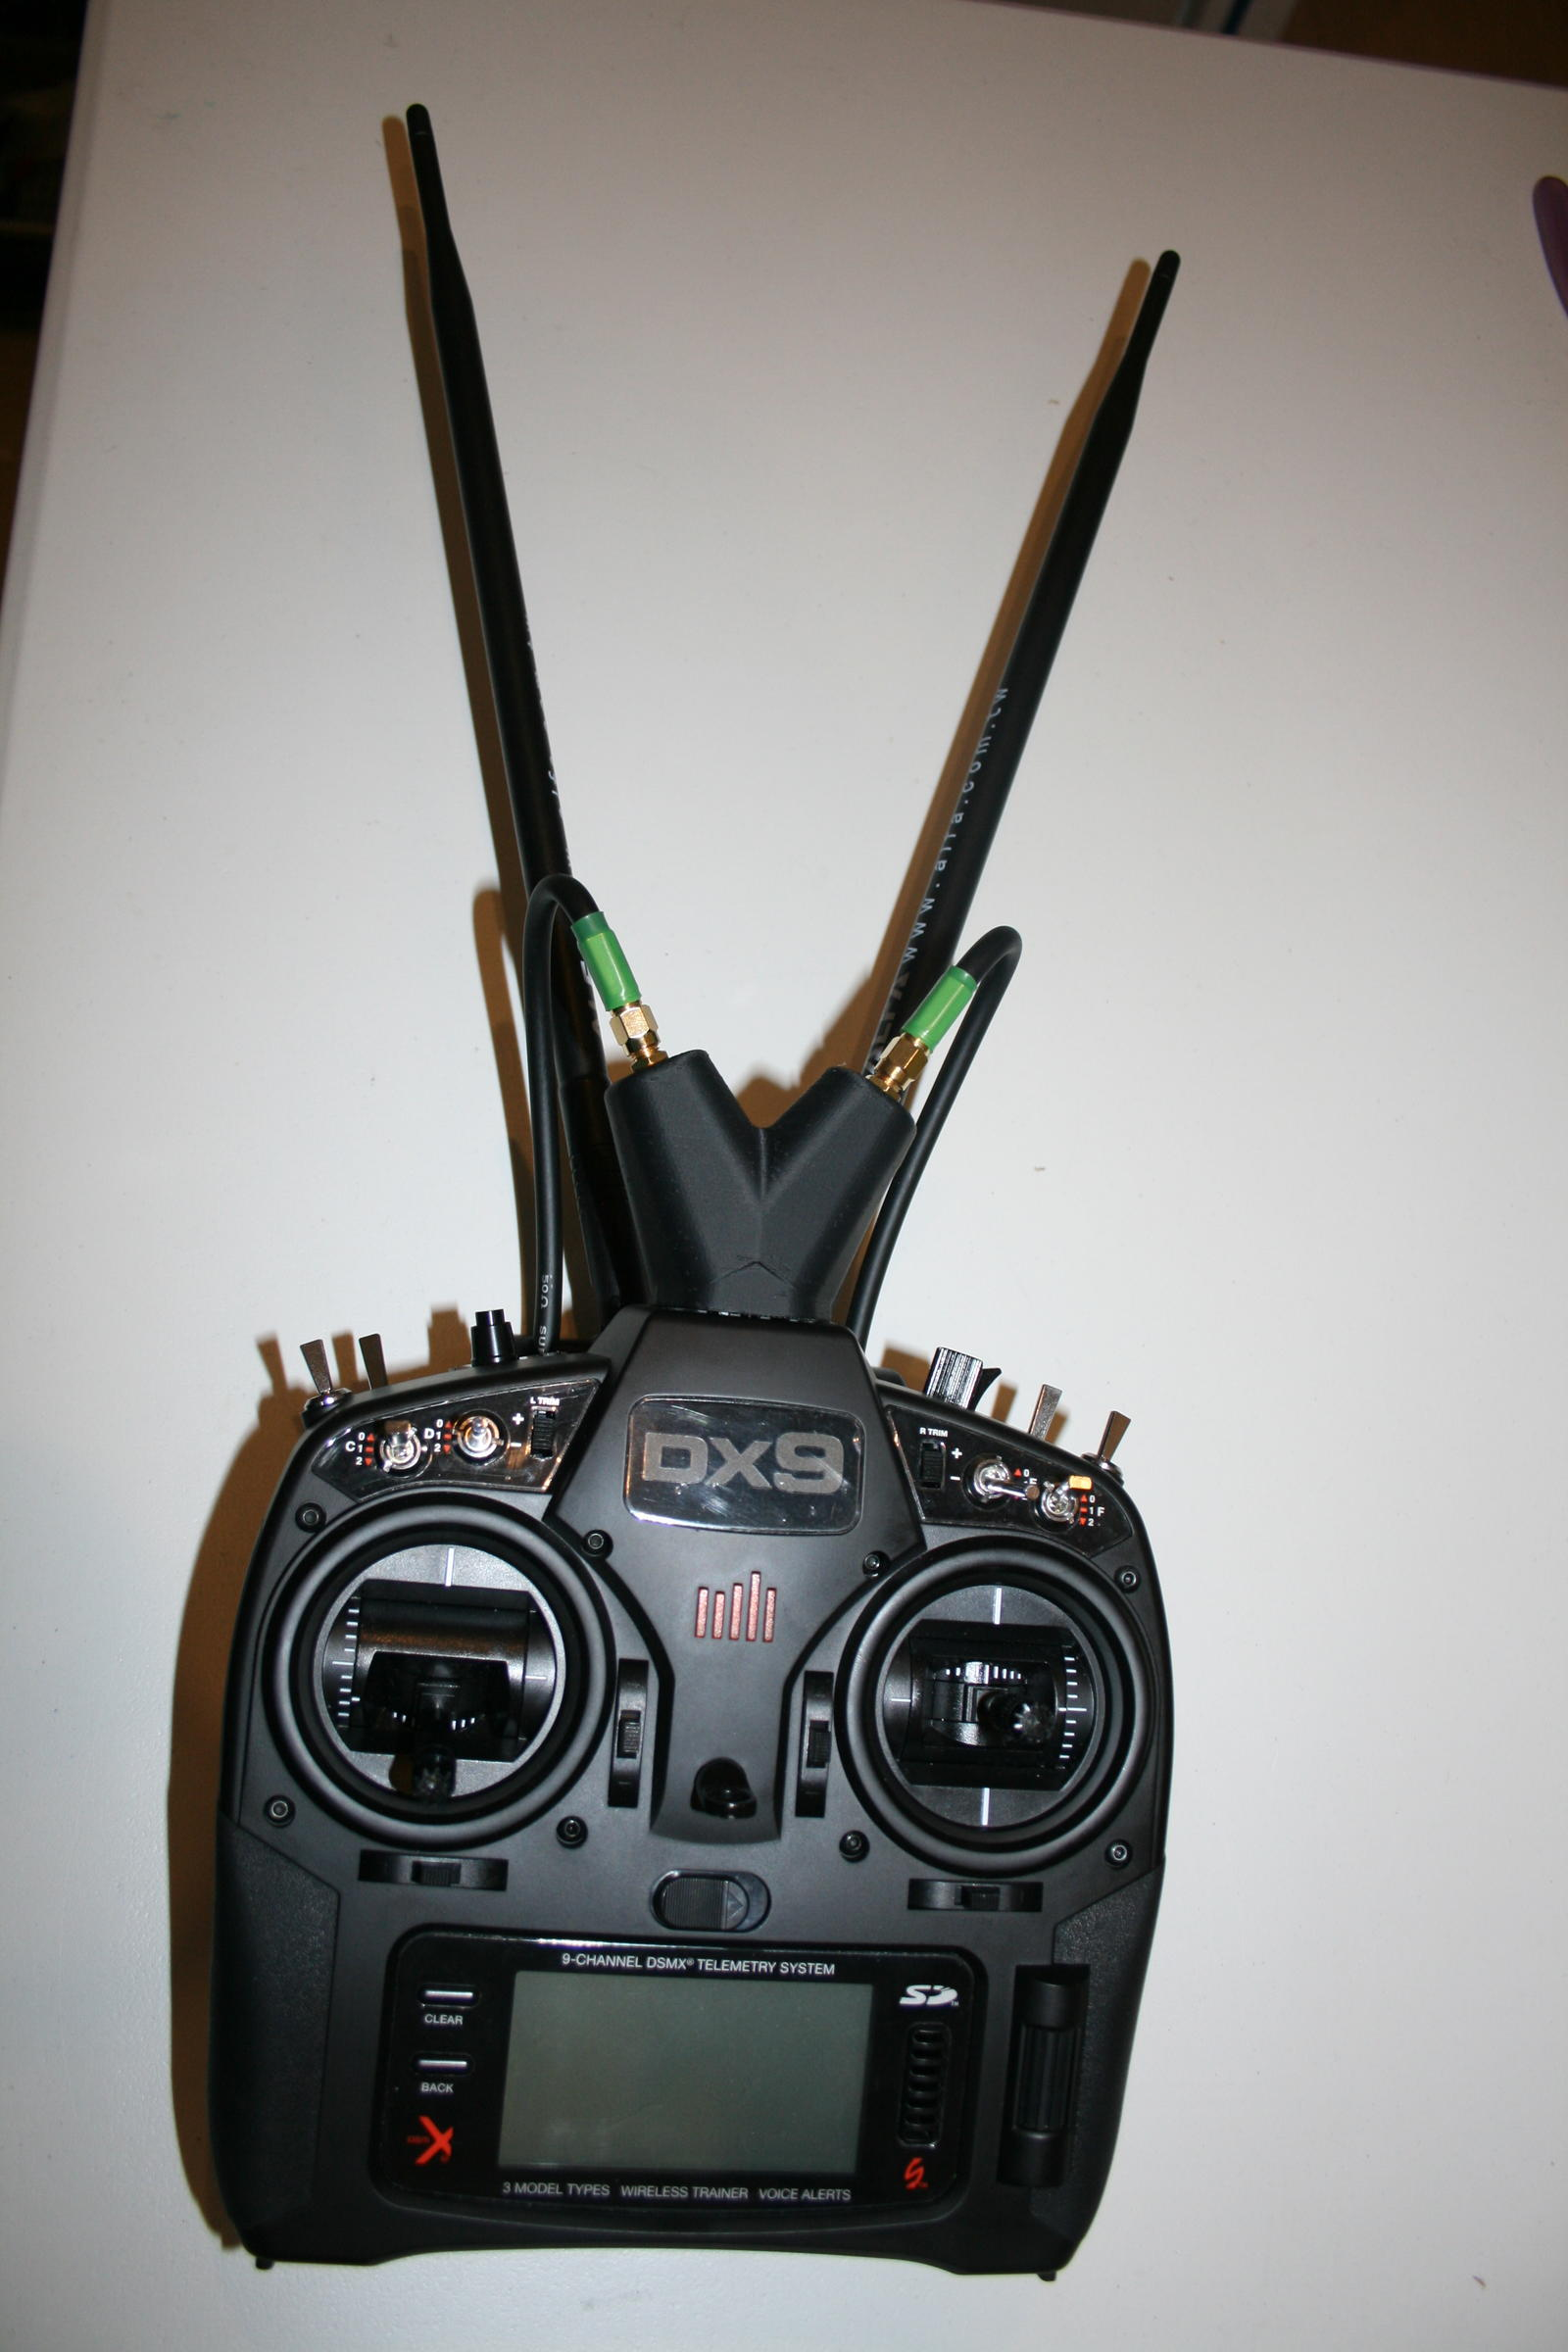 Spektrum DX9 Tx Range Booster Kit Stages 1 to 4 - RC Groups